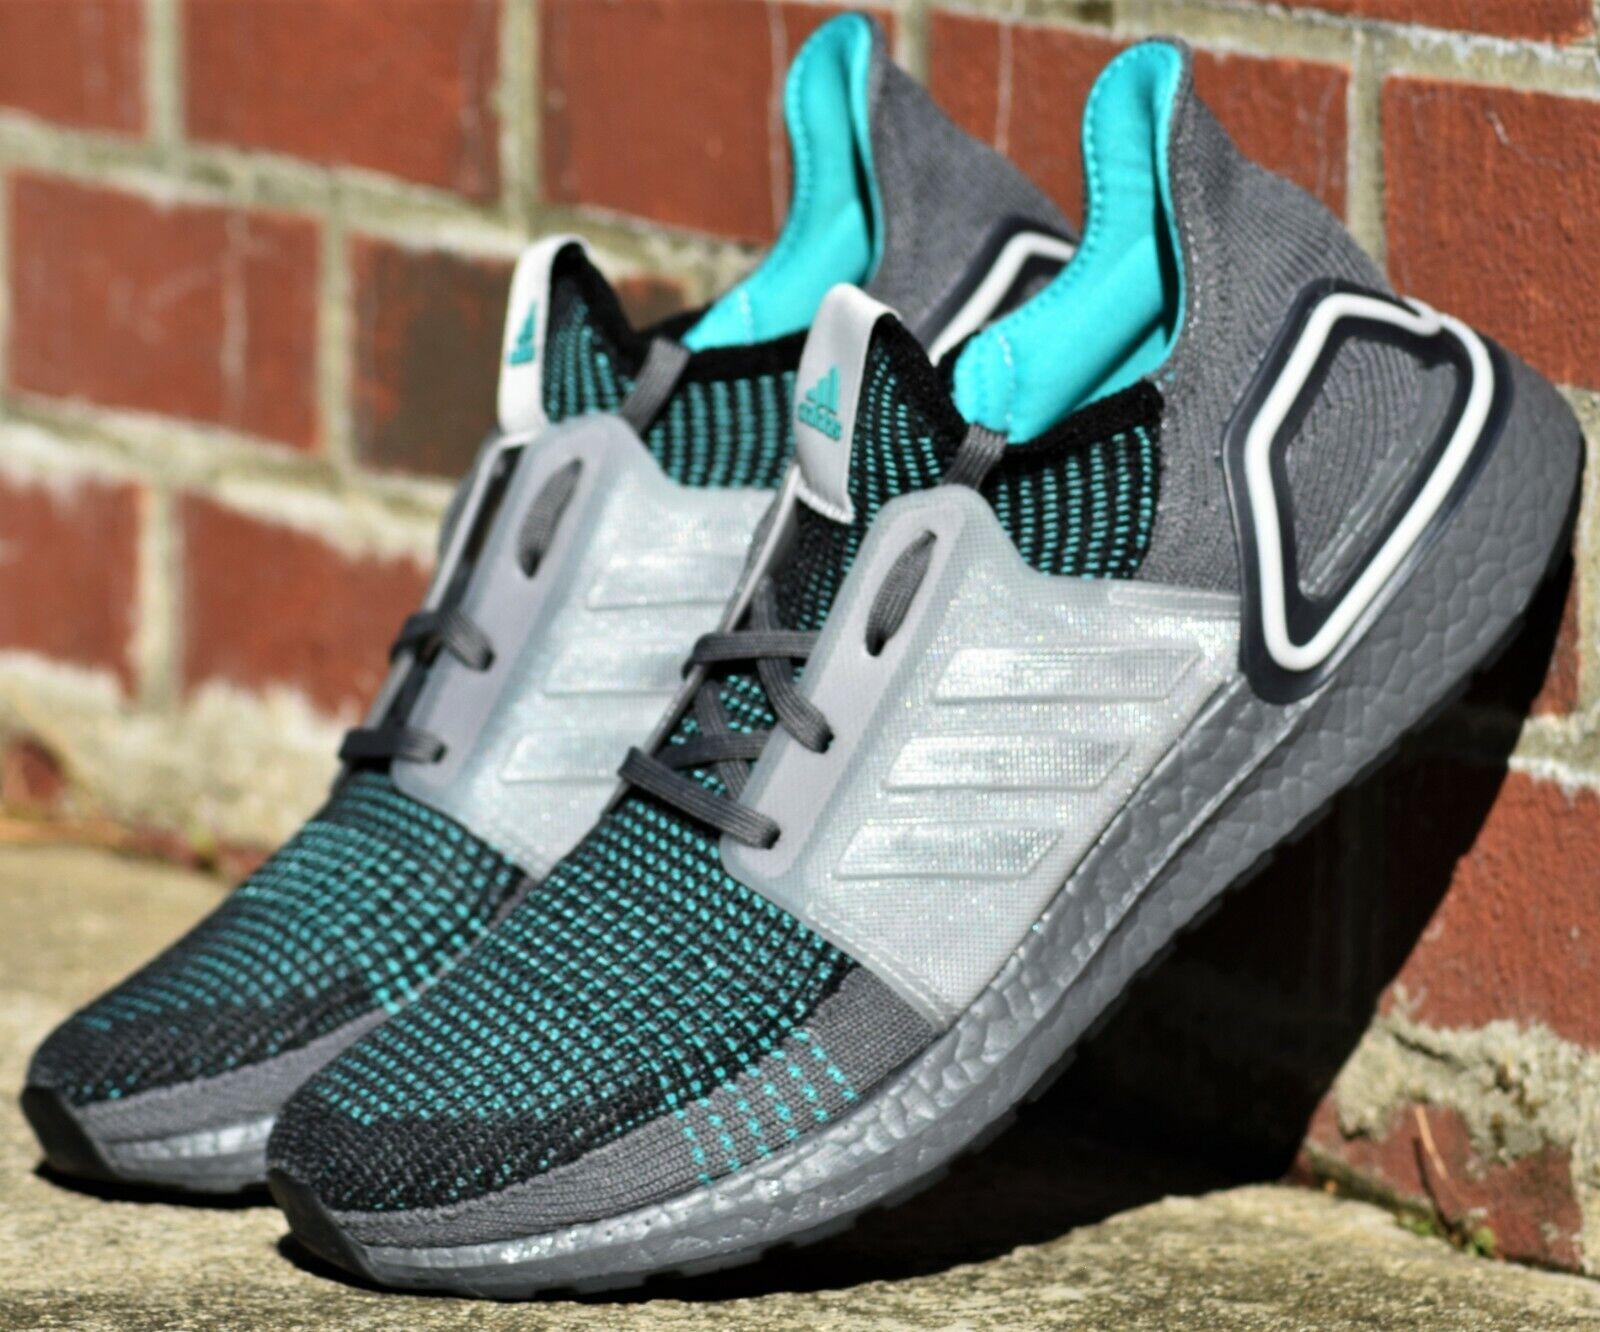 adidas boost running shoes mens black